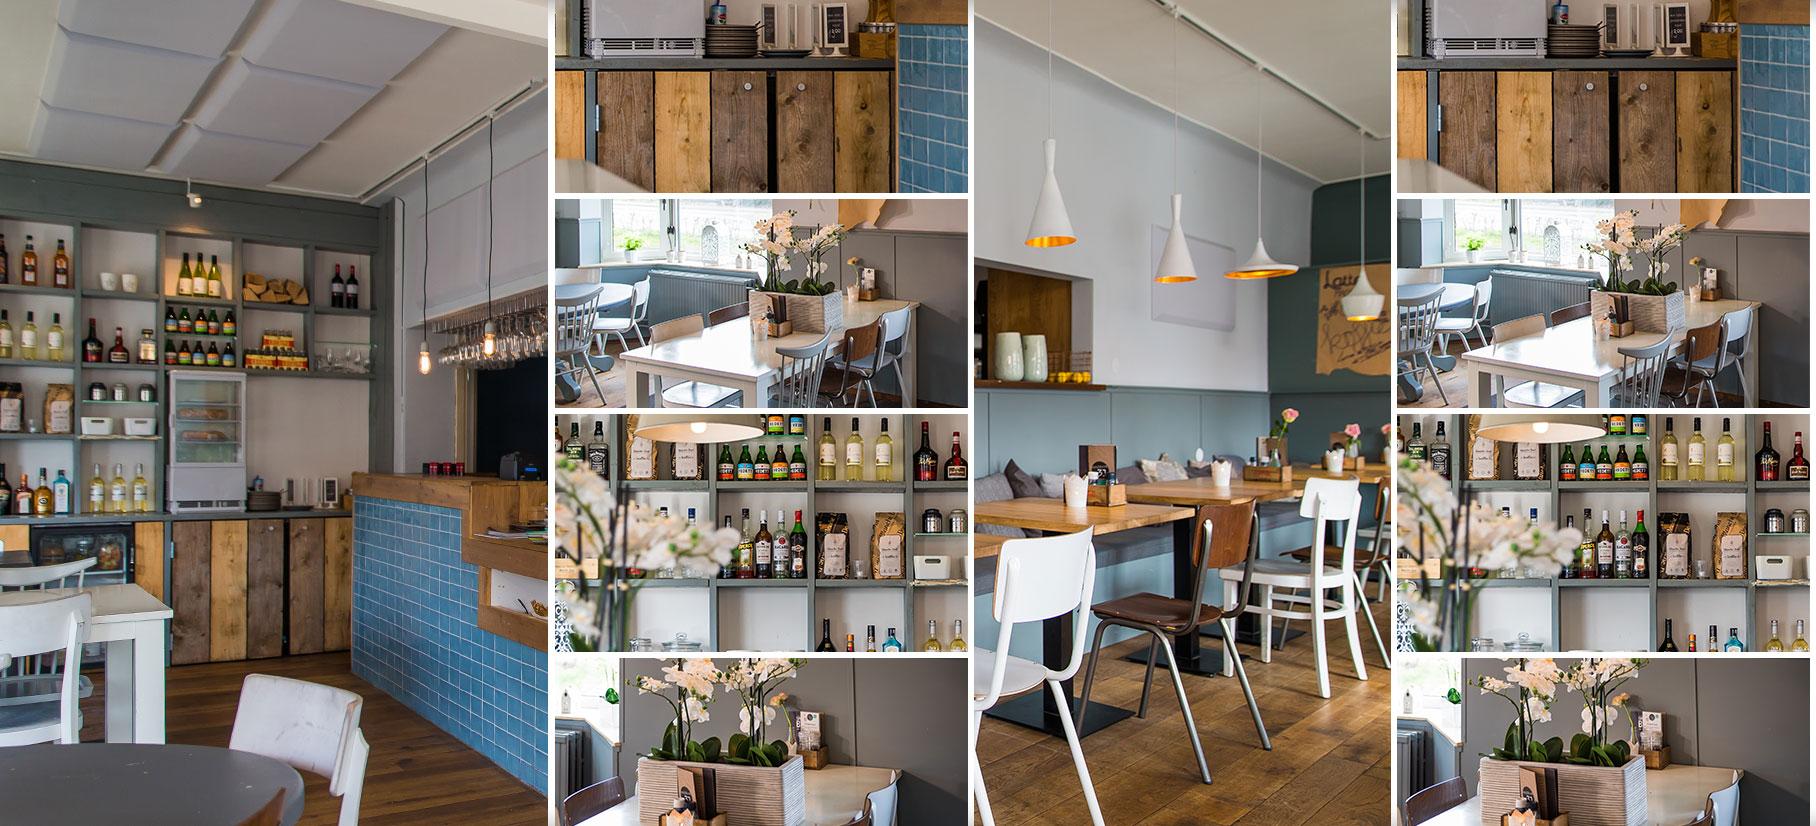 WINDRAAK31 | Restaurant met Speeltuin in Sittard